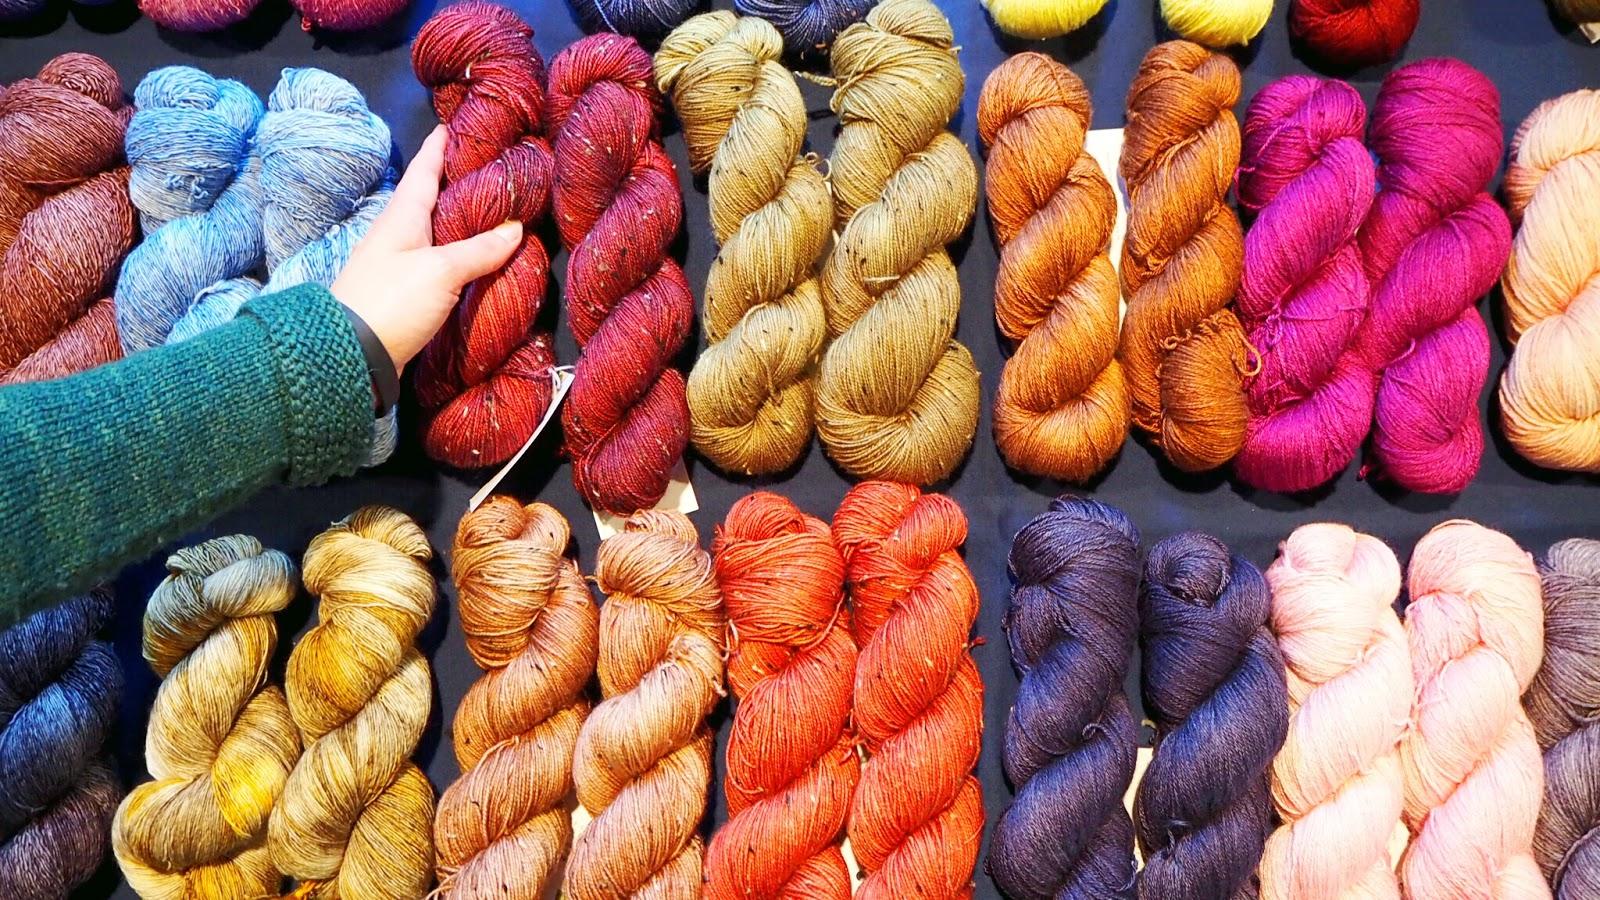 Ovillo Wolle handgefa%25CC%2588rbte Garne